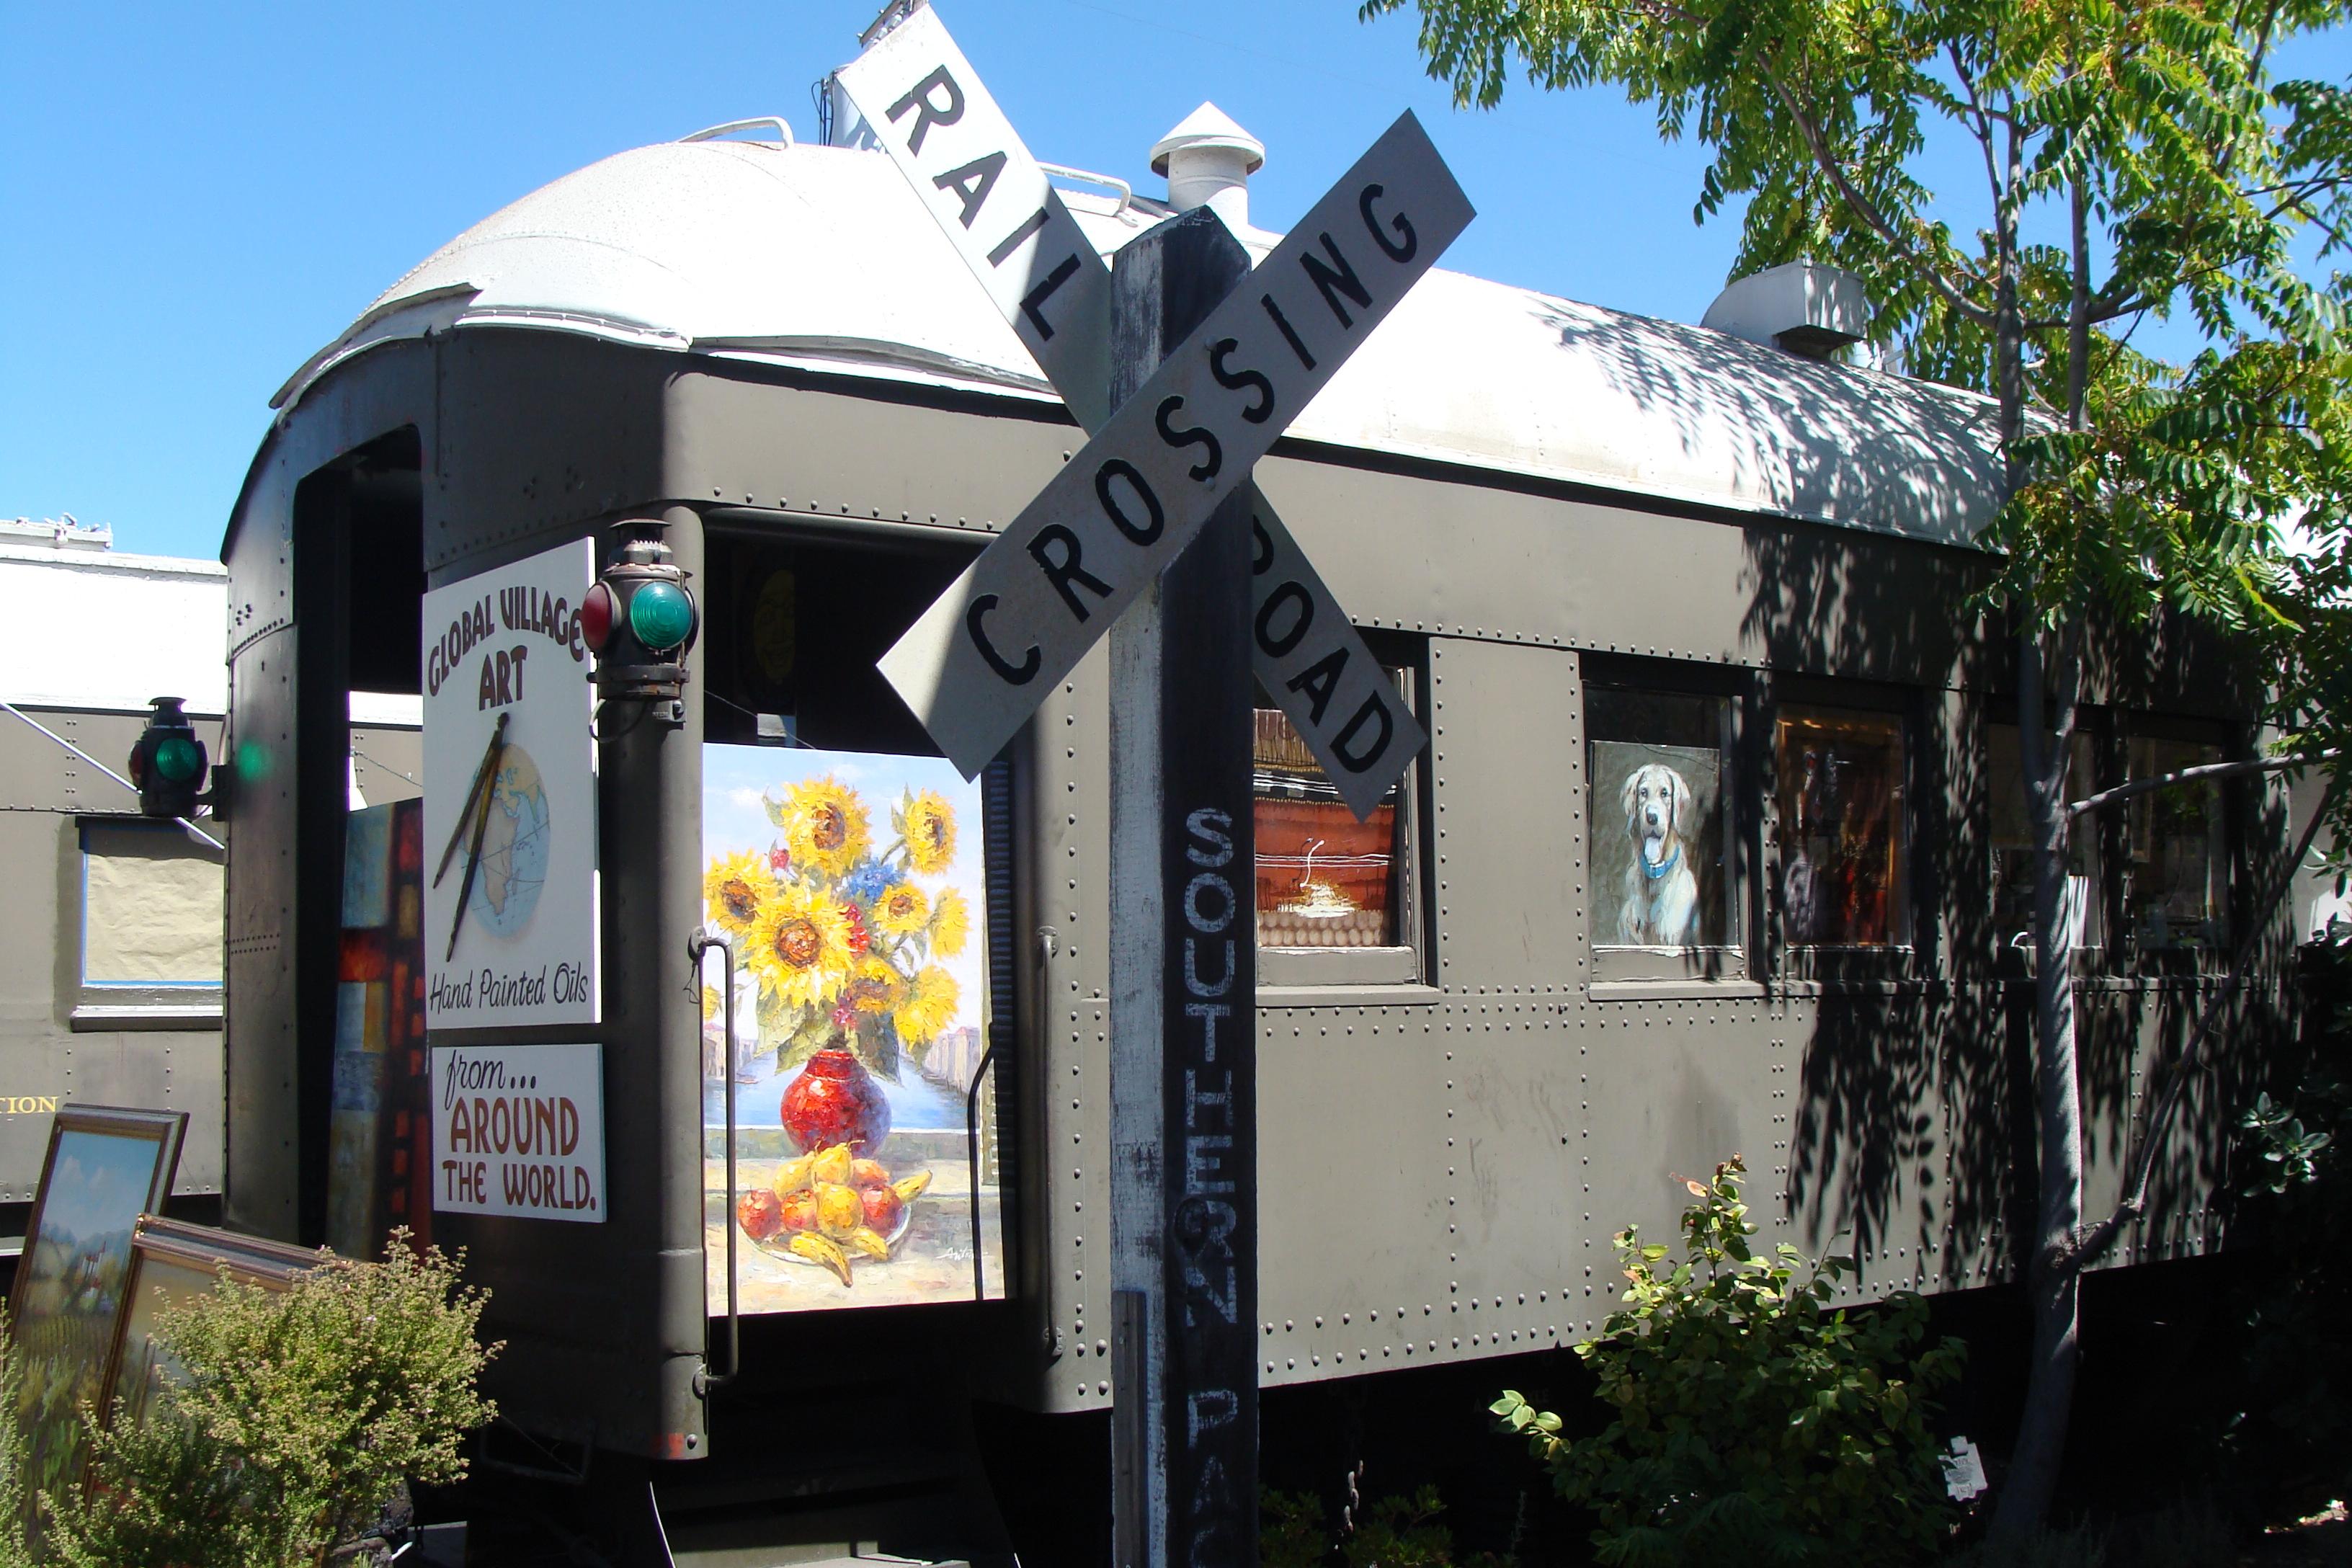 Art gallery in a former train wagon in Calistoga